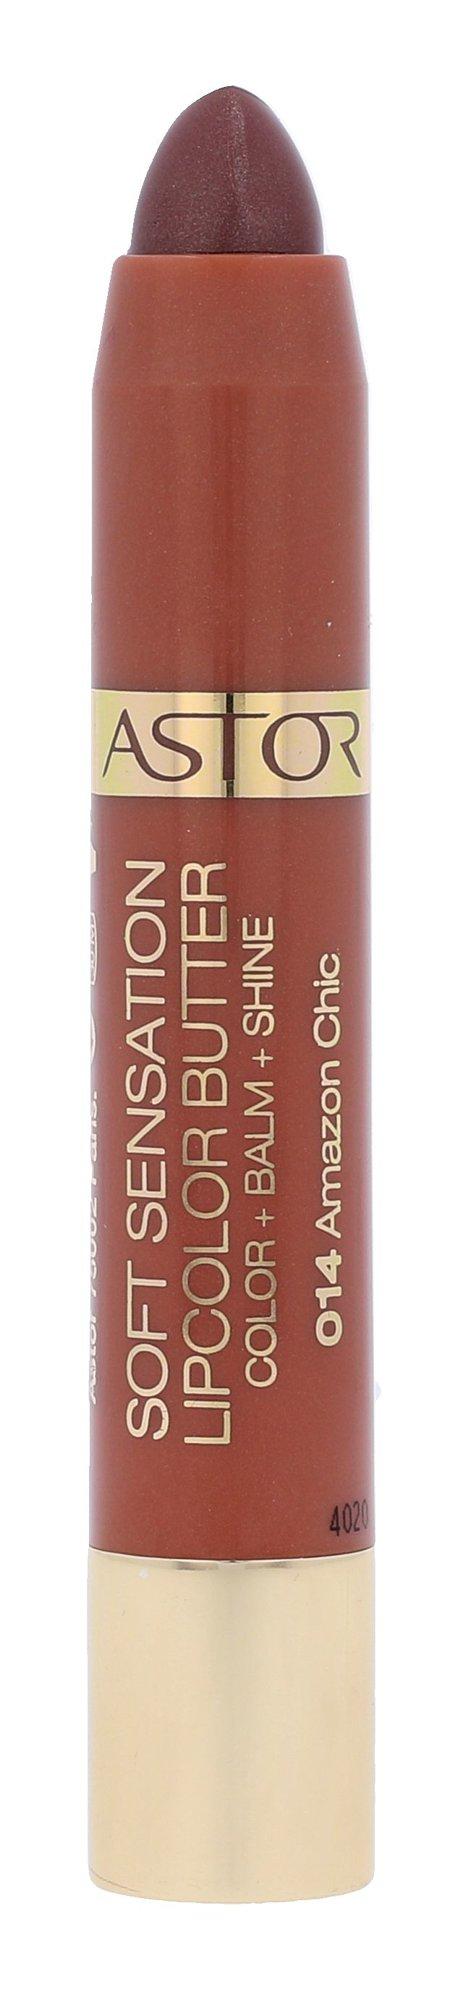 ASTOR Soft Sensation Cosmetic 4,8ml 014 Amazon Chic